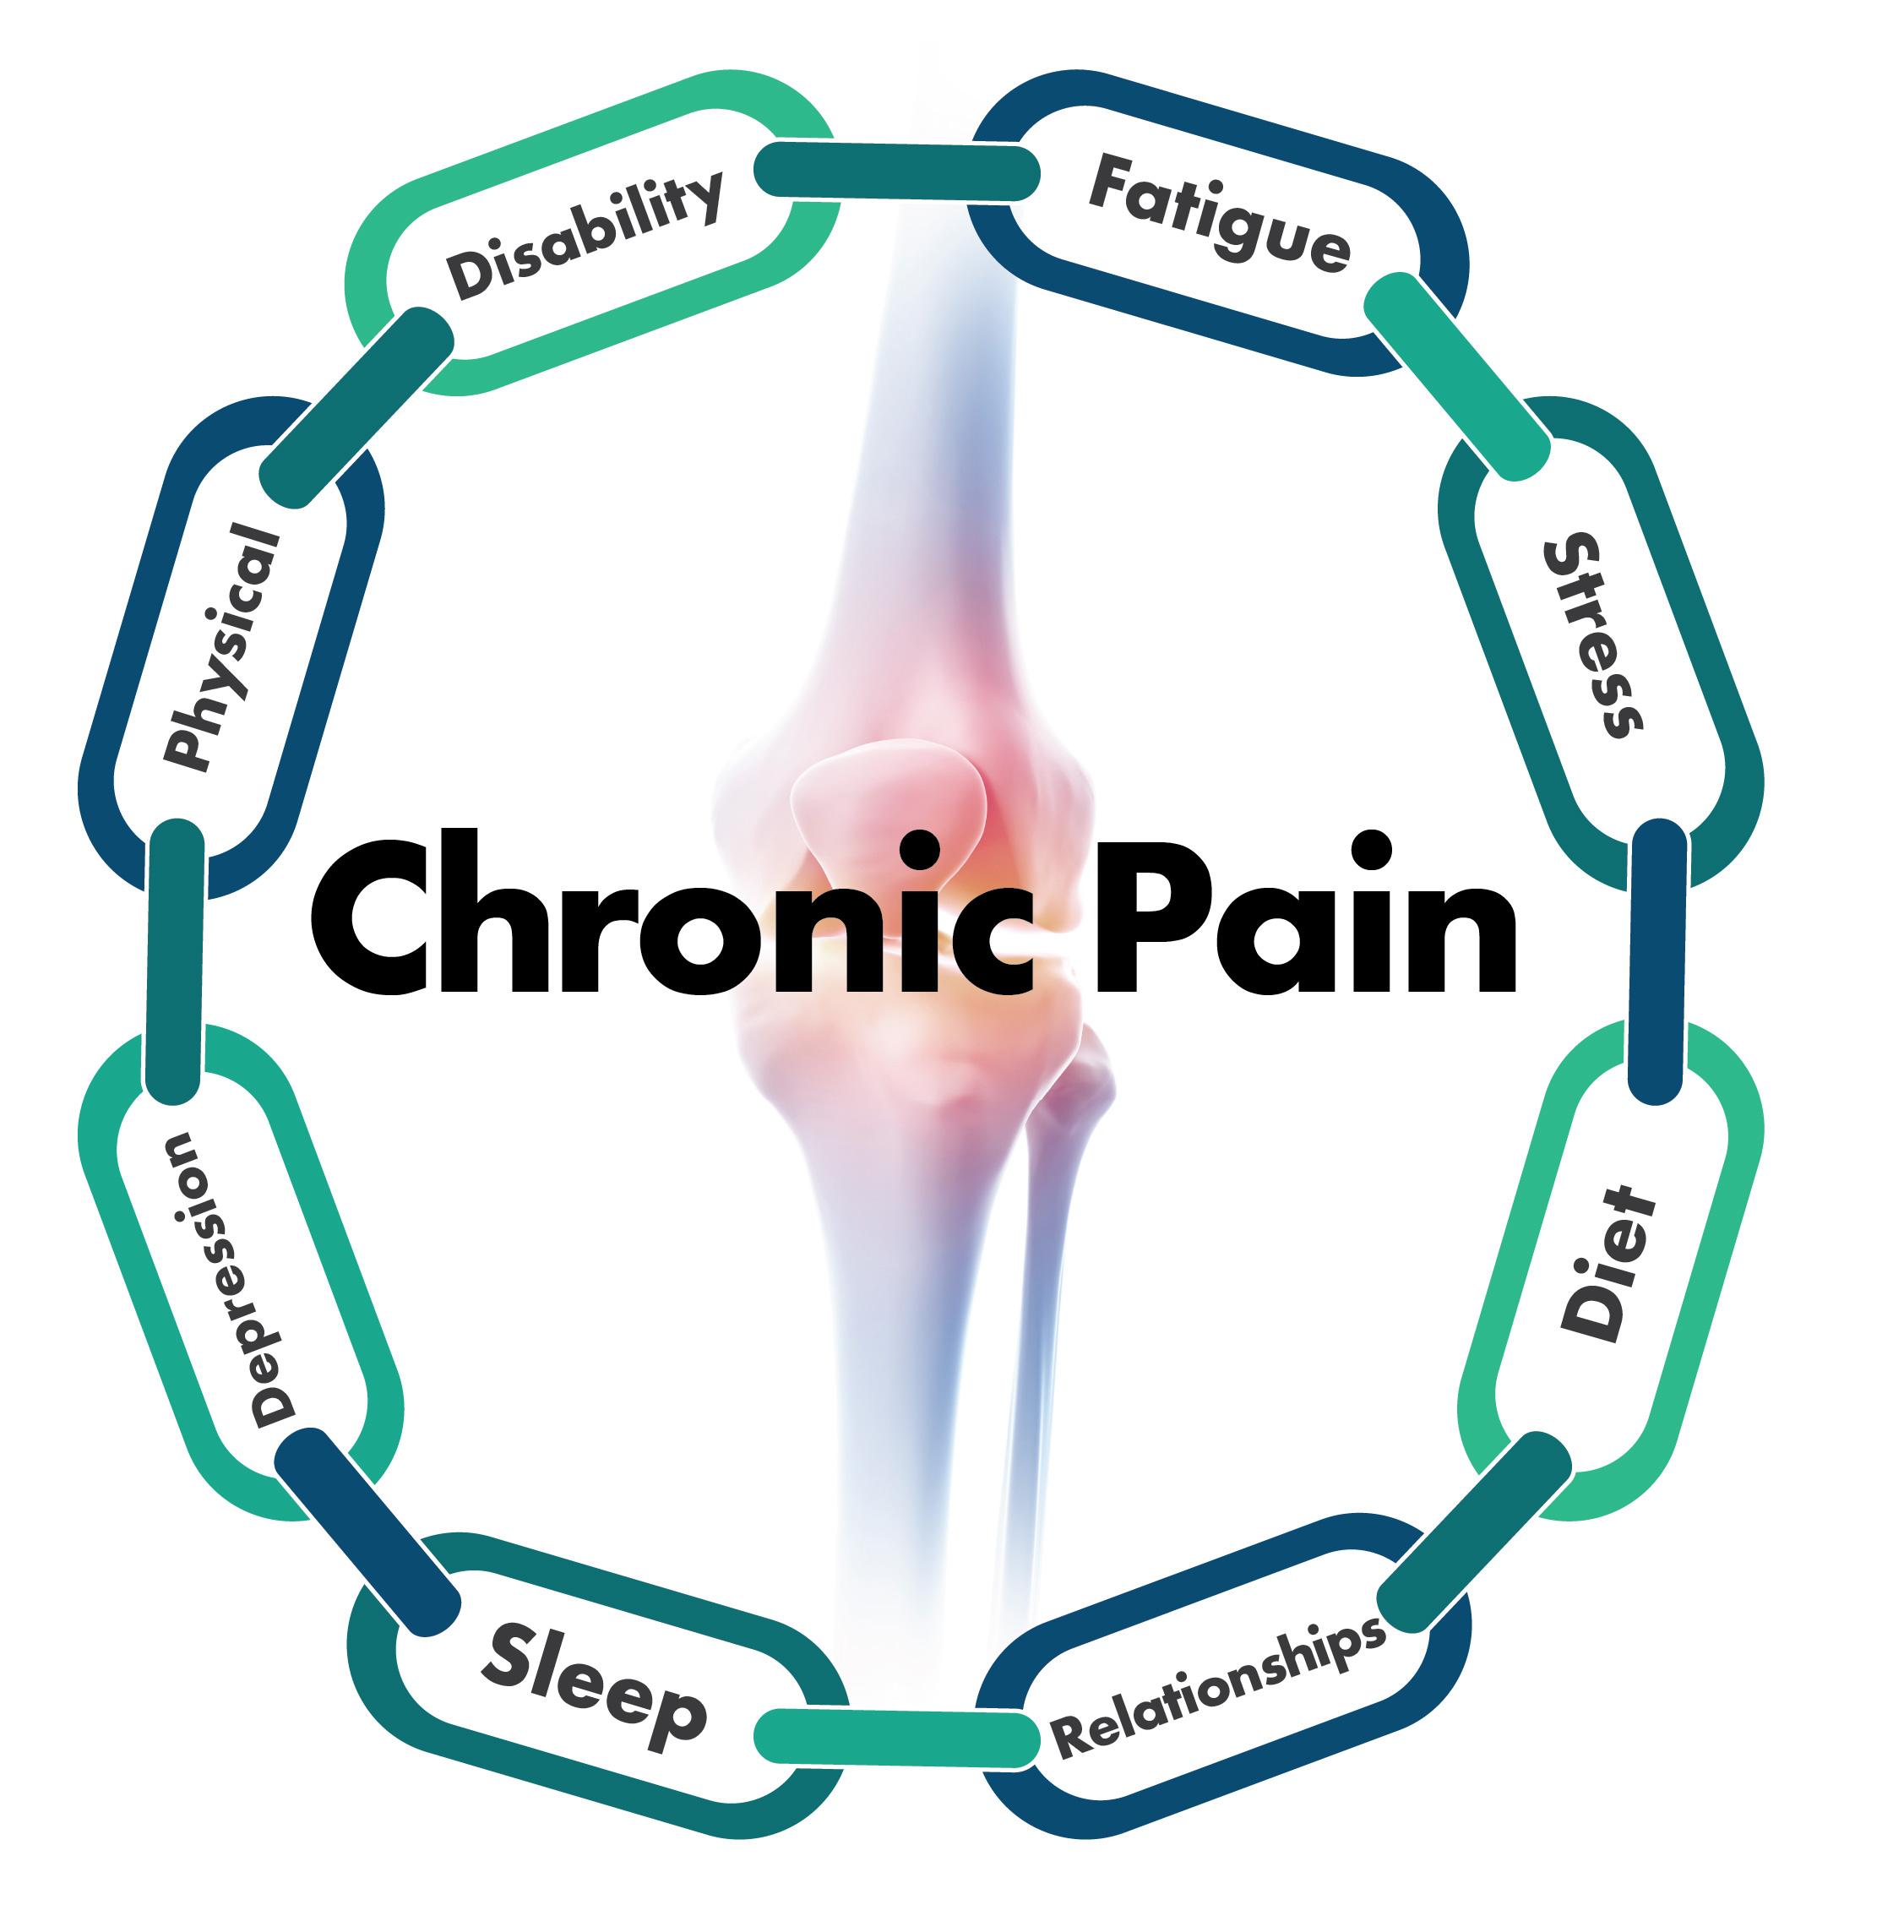 chronic-pain-chain-diagram